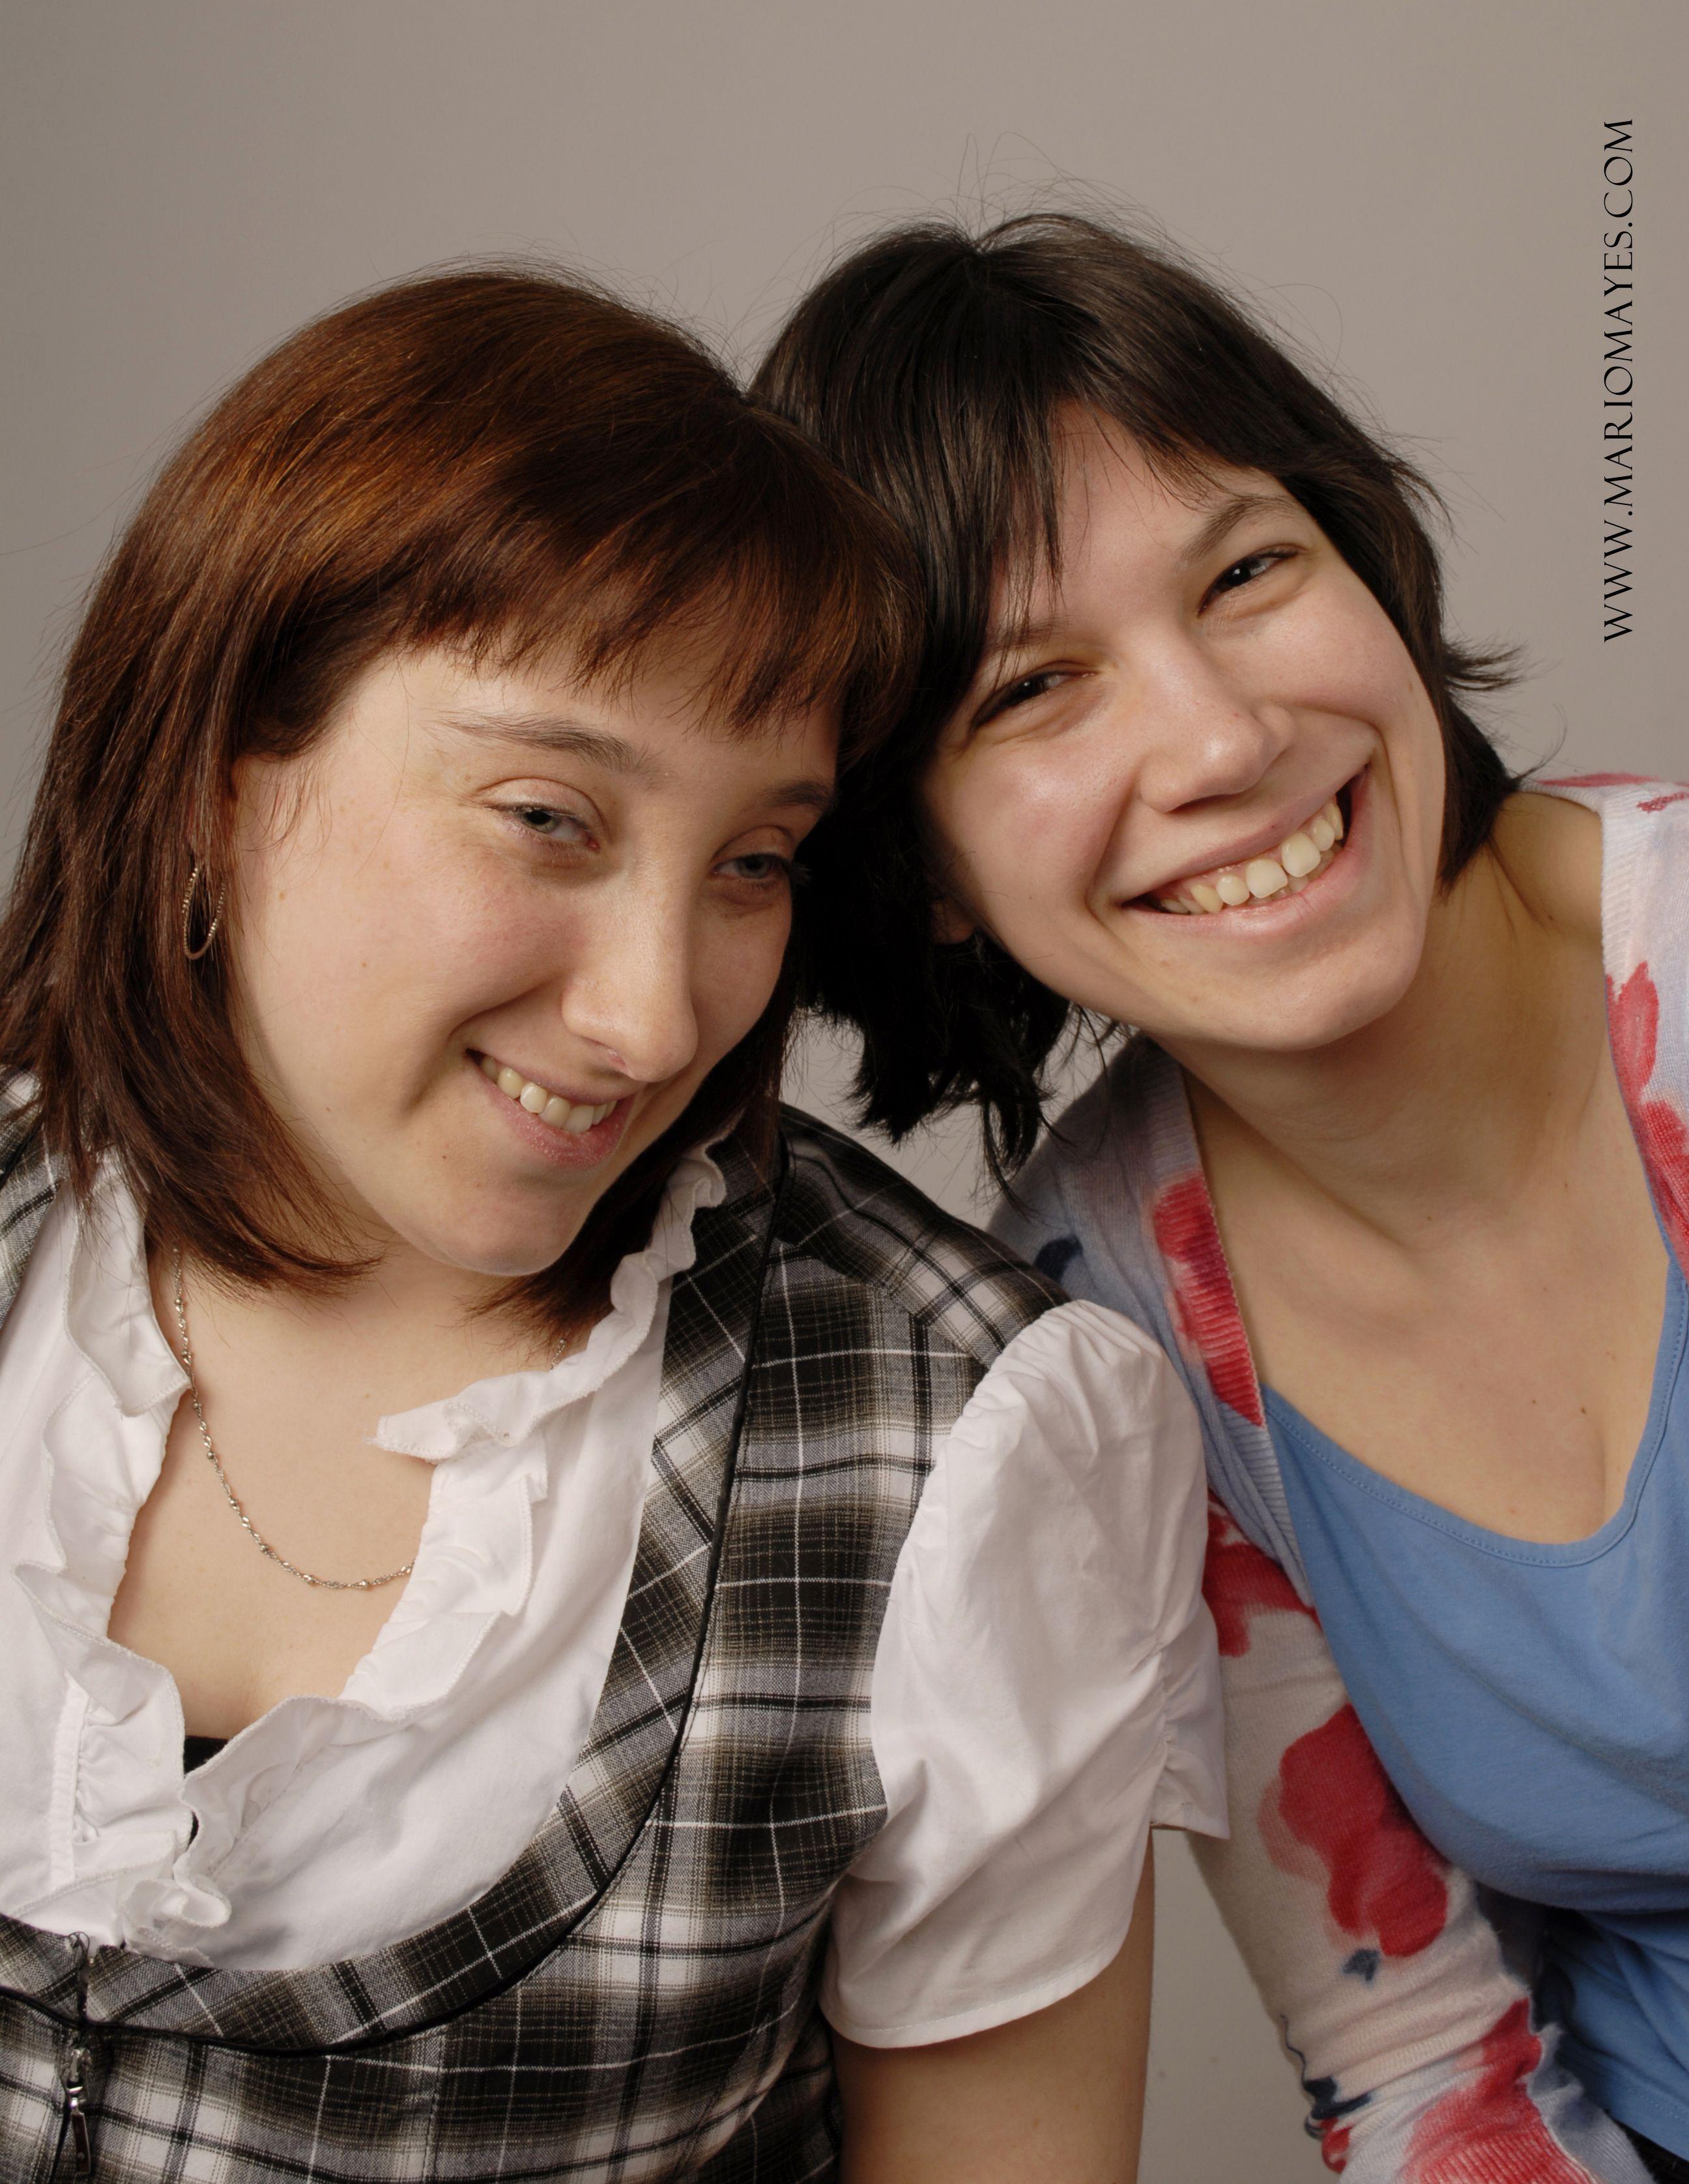 Sarah et Valérie (Québec)